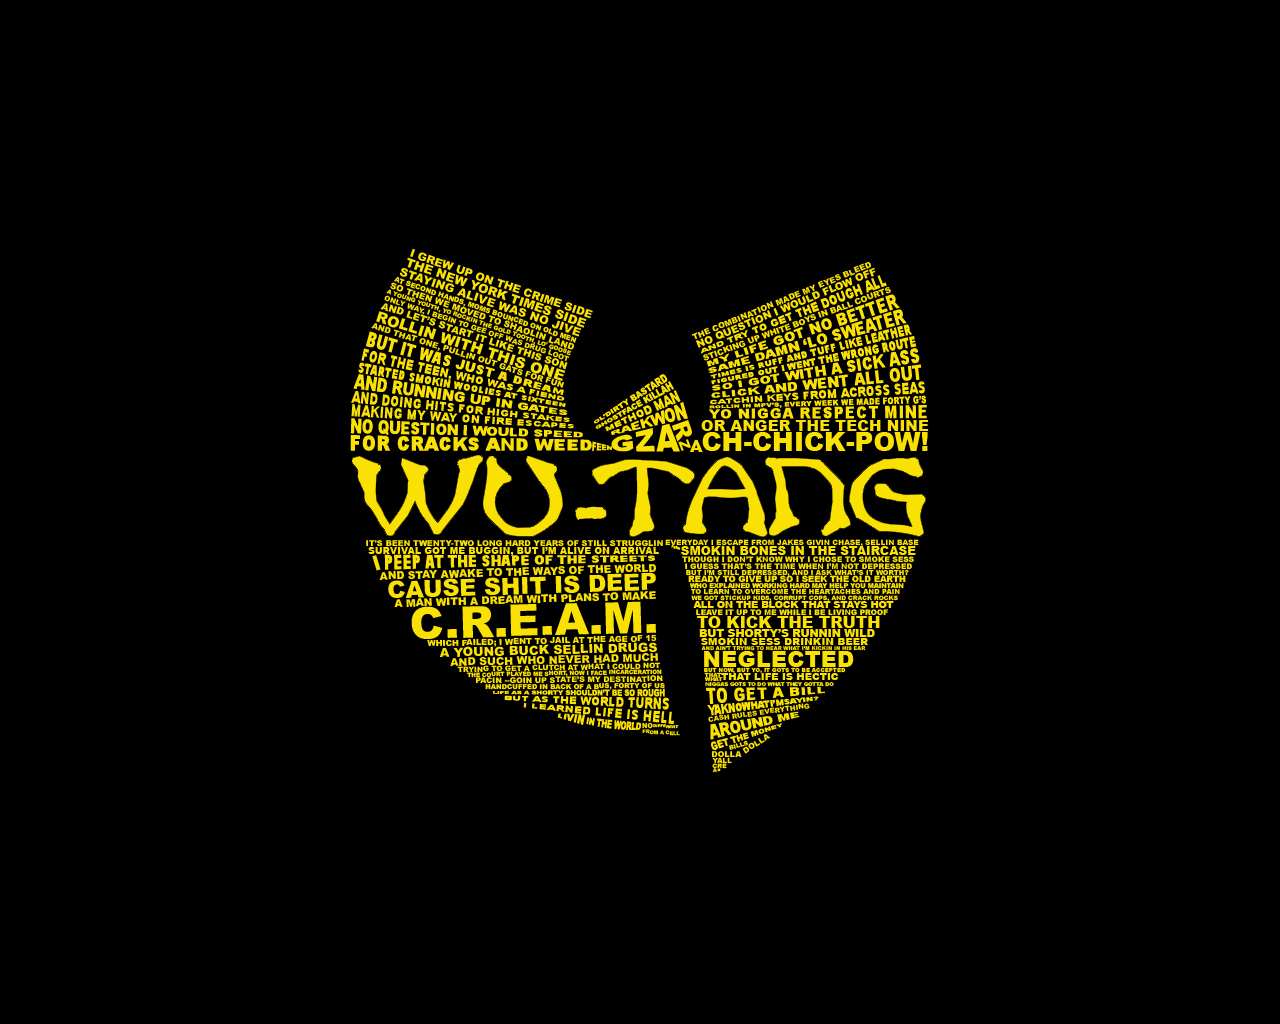 http://2.bp.blogspot.com/-K5MvJcGdW2o/T65_bQQjQqI/AAAAAAAAA4o/2NZtWz3t4pM/s1600/Wu_Tang_Clan_Wallpaper_by_Feenster64.jpg